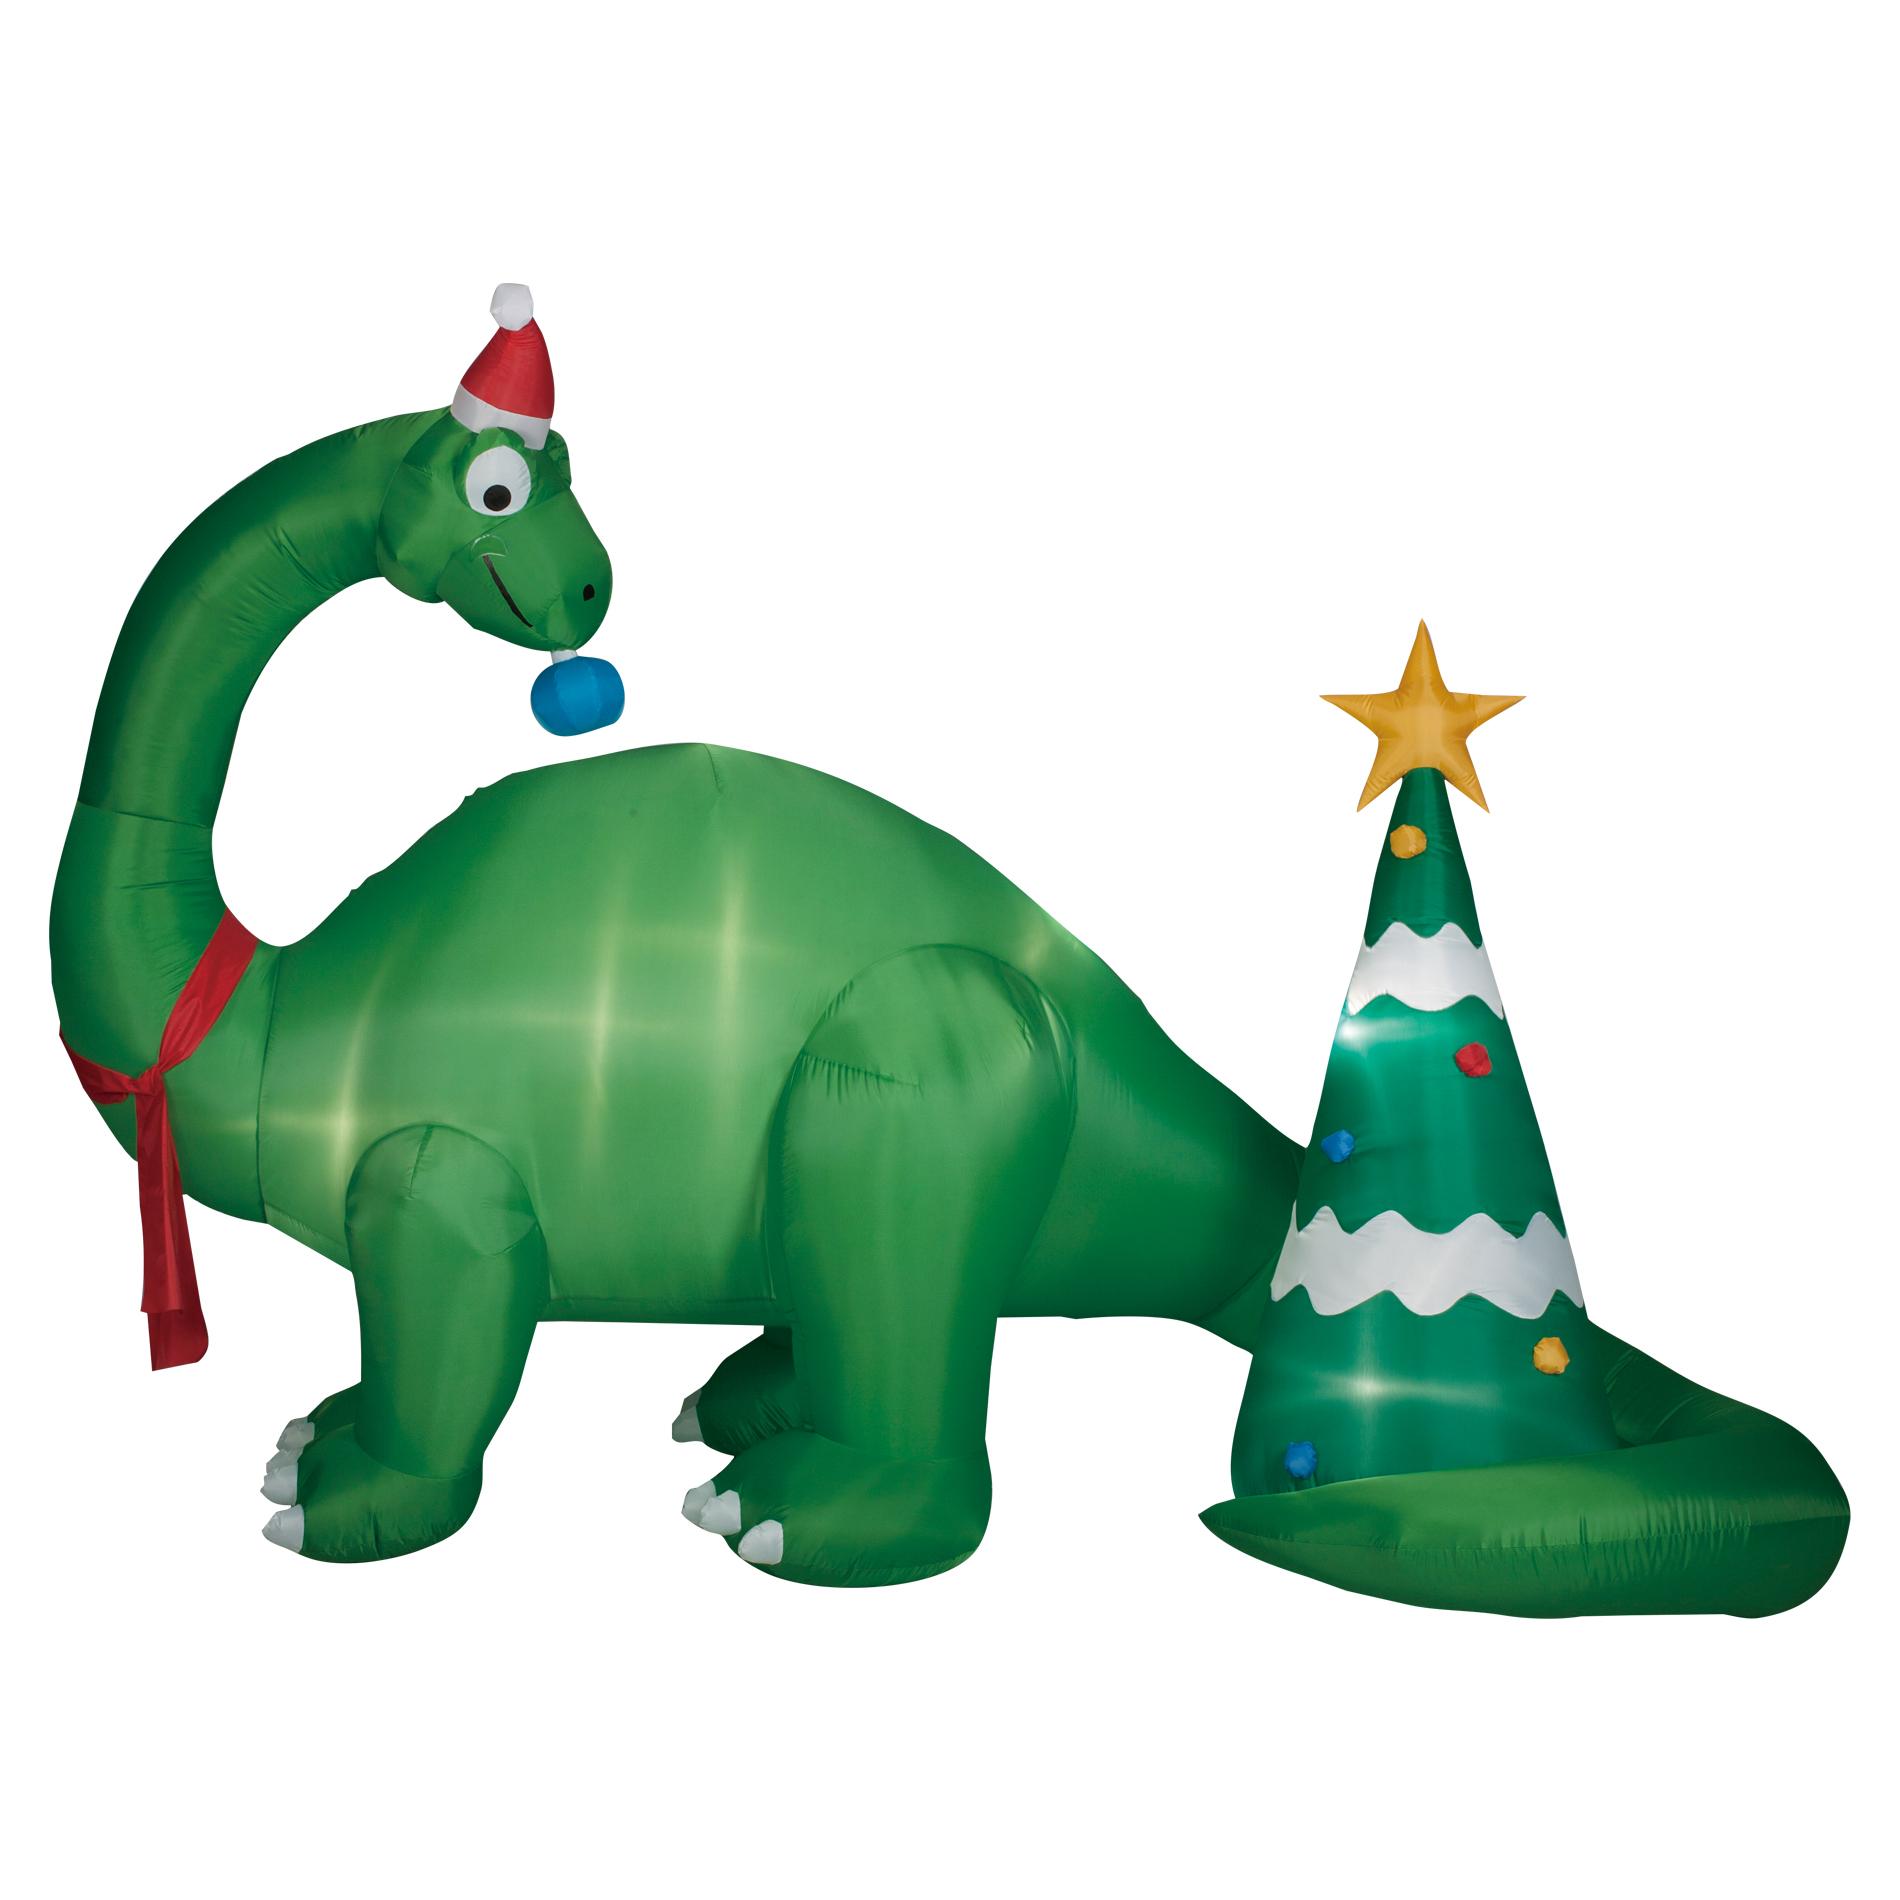 95 Foot Brontosaurus Scene Inflatable Decoration